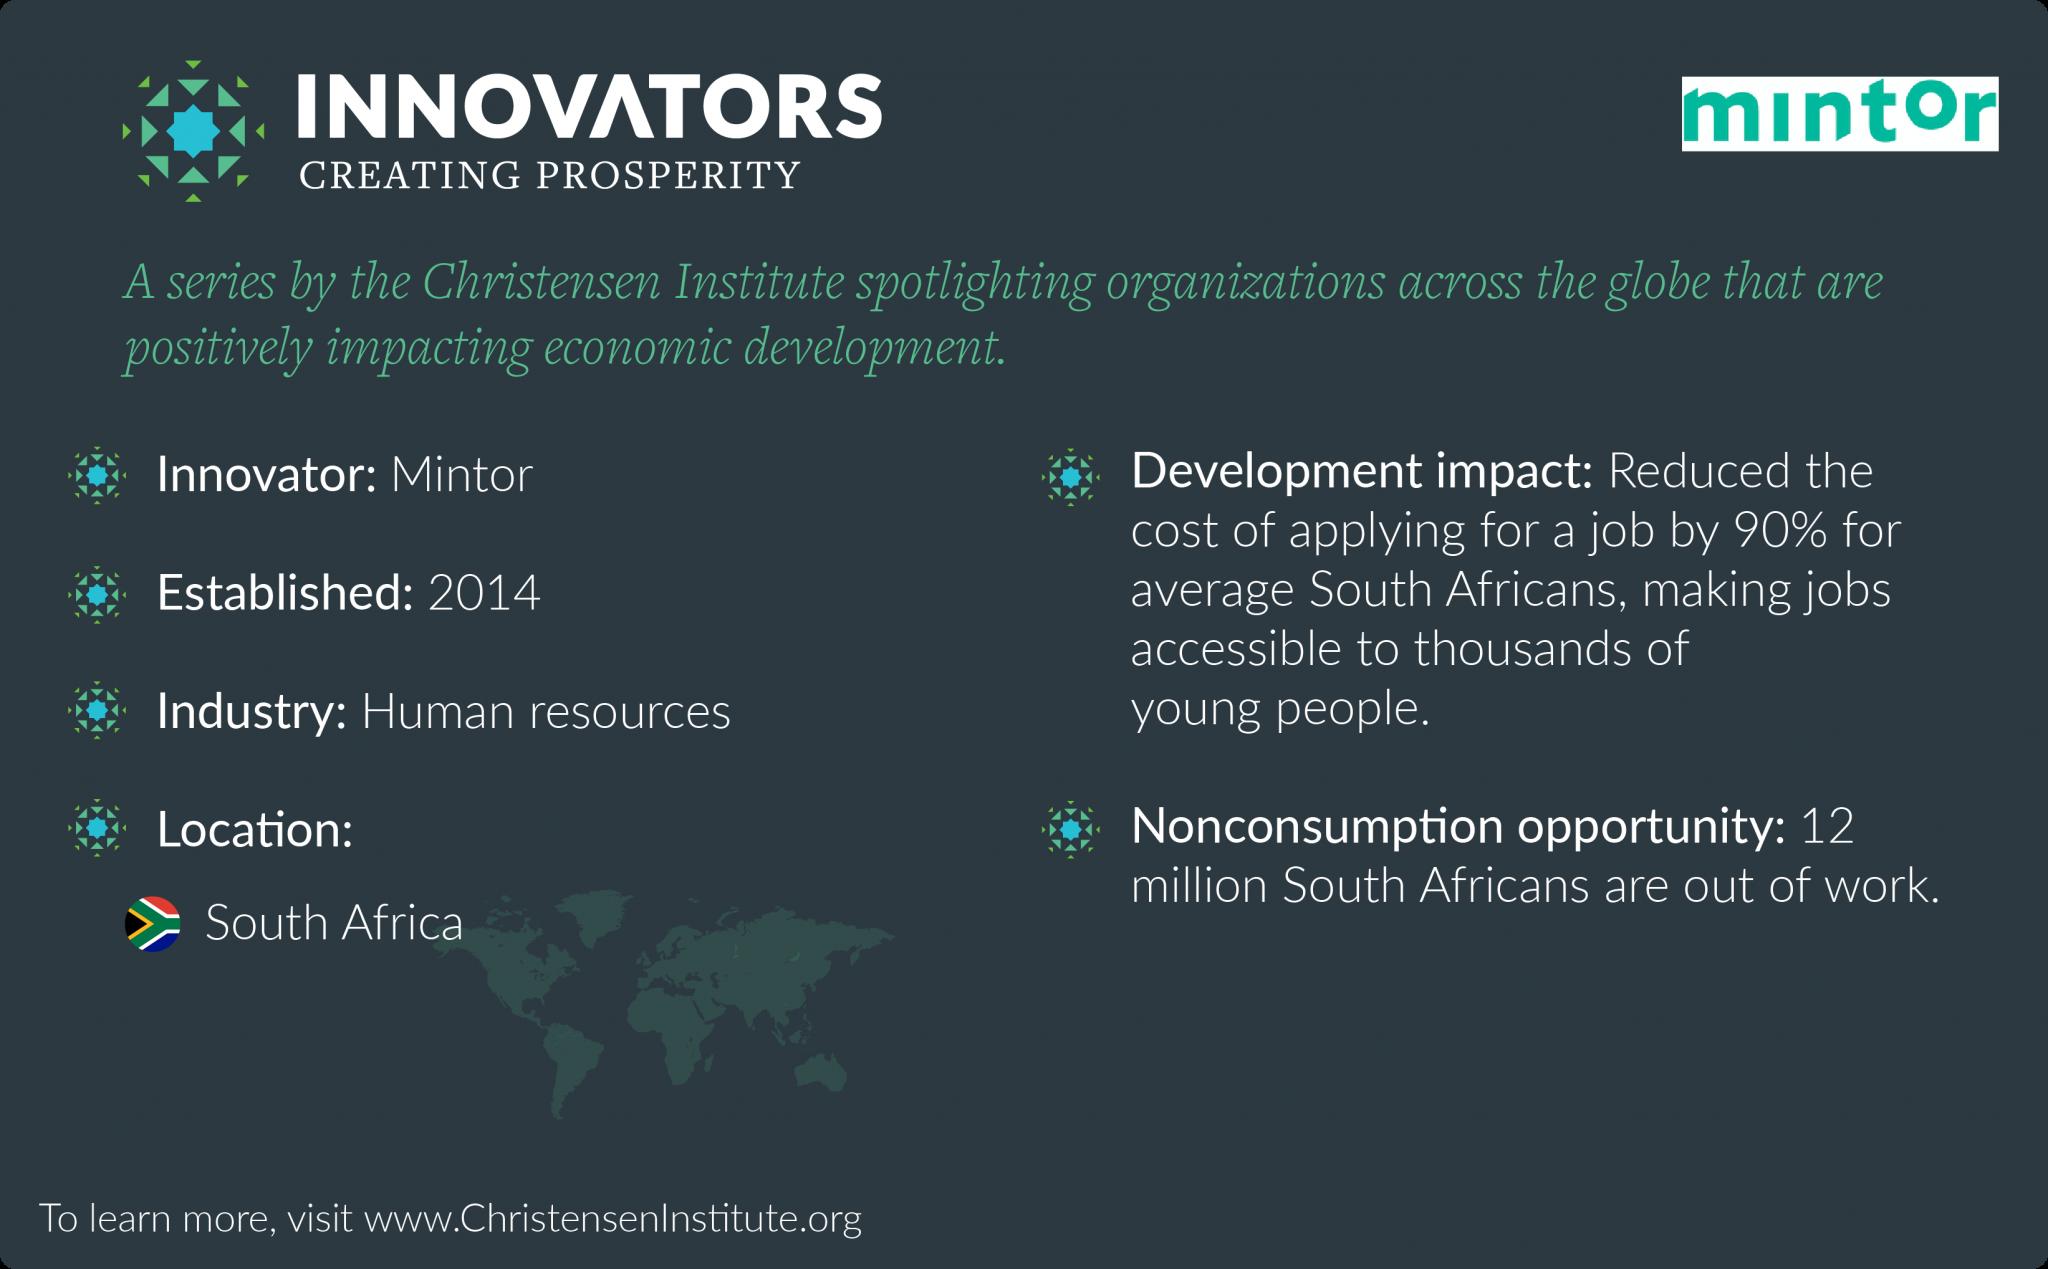 Innovators Creating Prosperity: Mintor